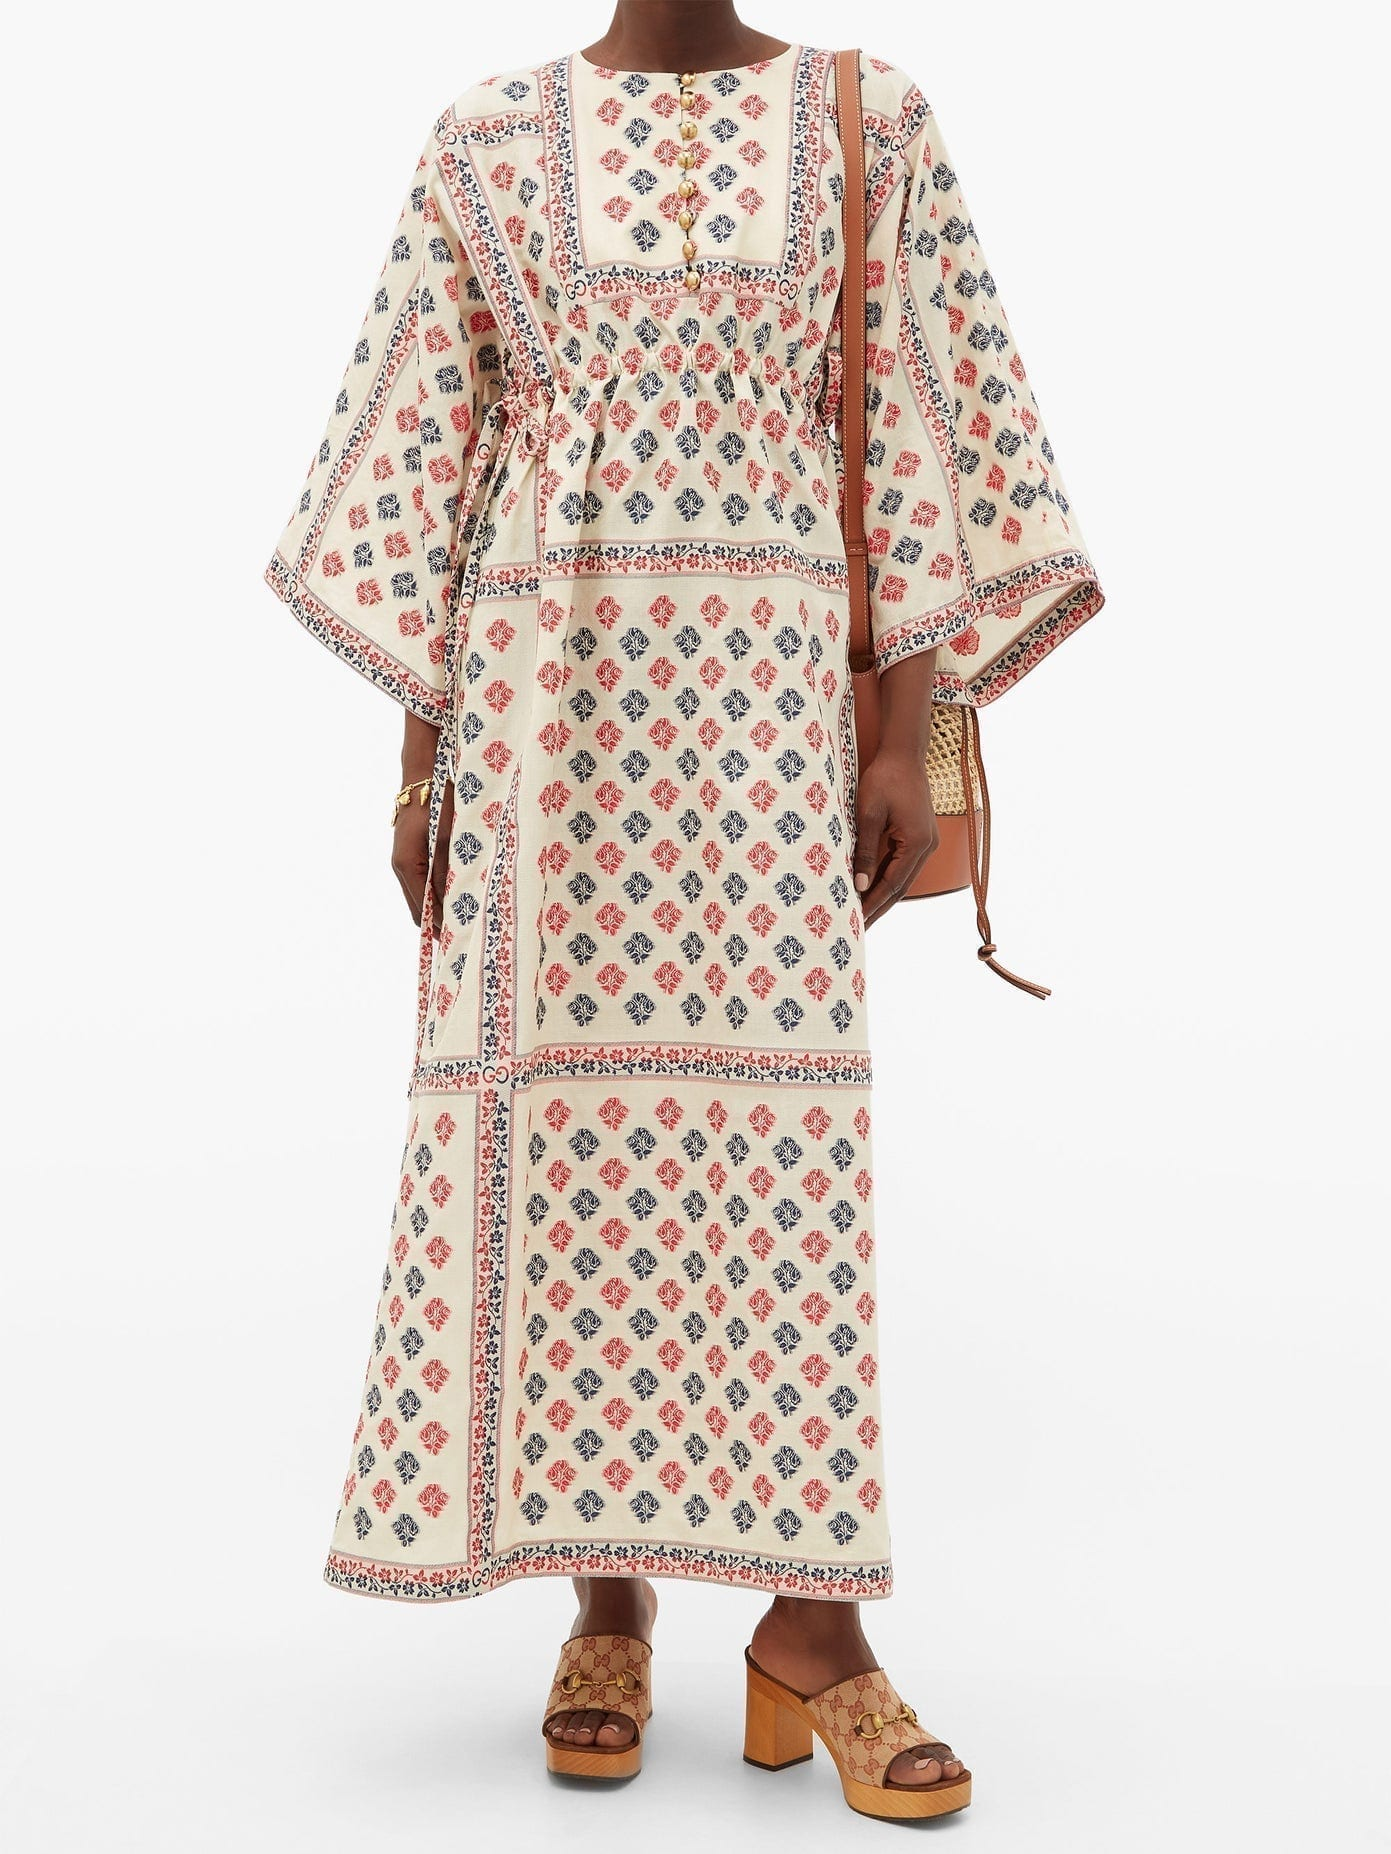 GUCCI Floral Cotton-blend Jacquard Kaftan Dress